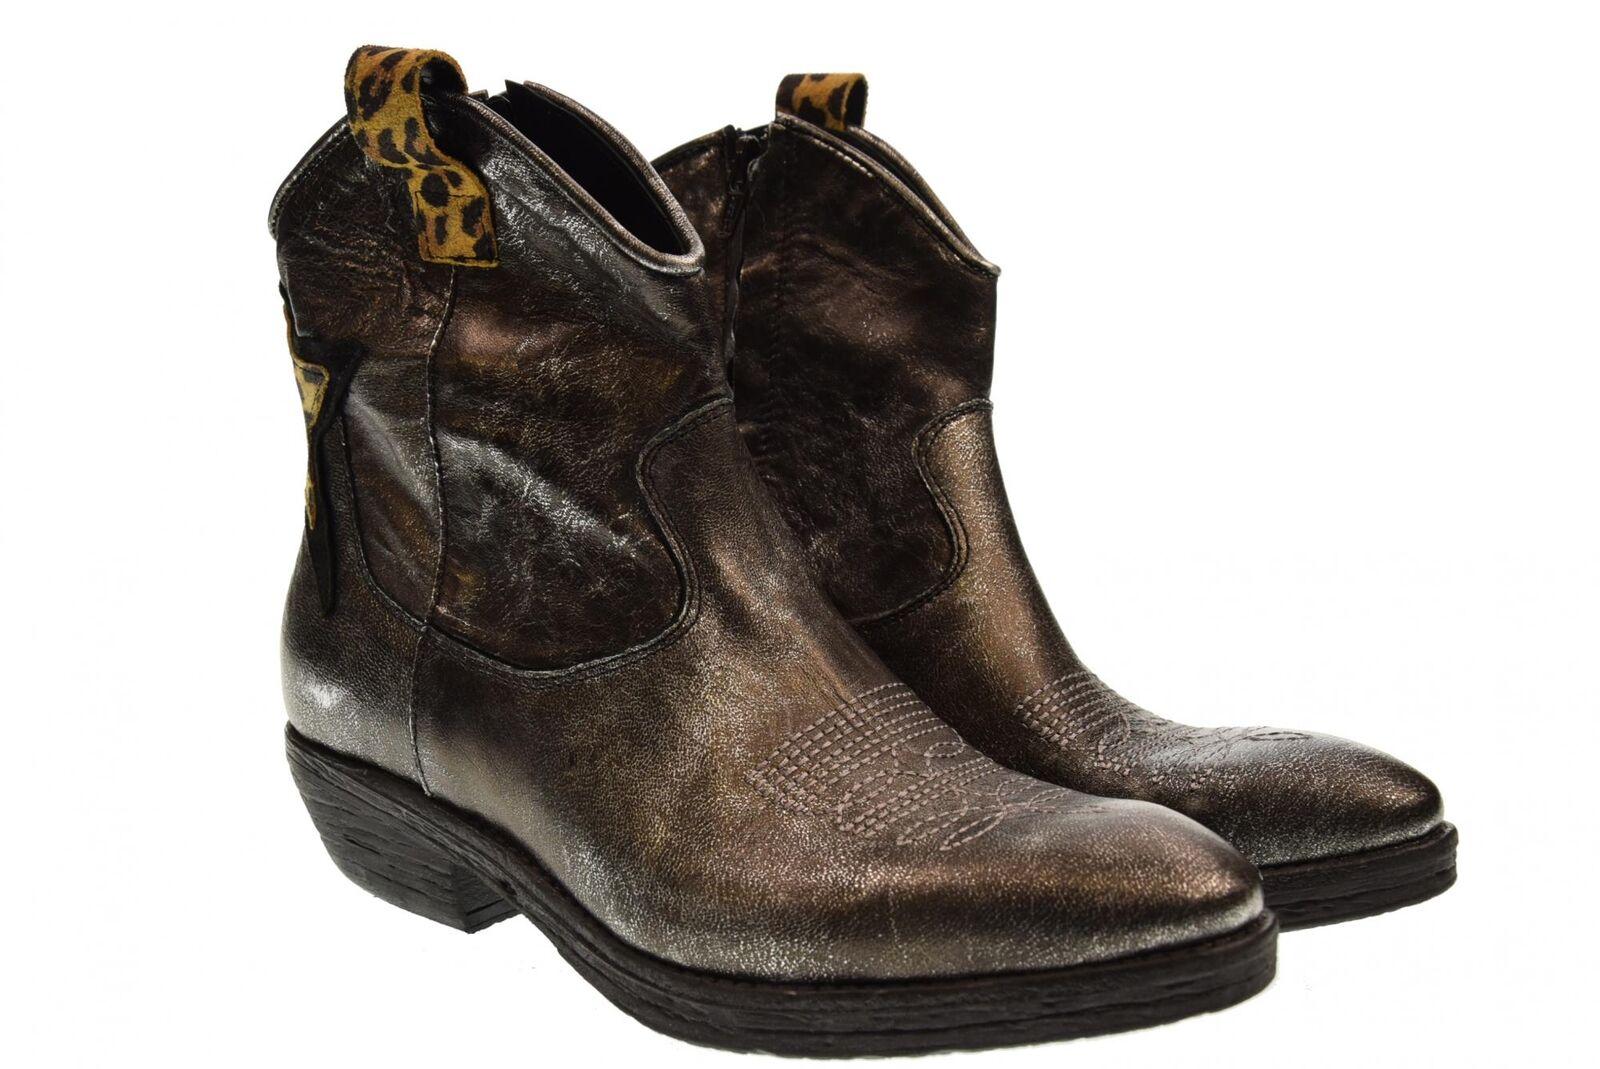 ErHombre's ErHombre's ErHombre's A18u mujer zapatos ankle botas WEST plata  mas preferencial